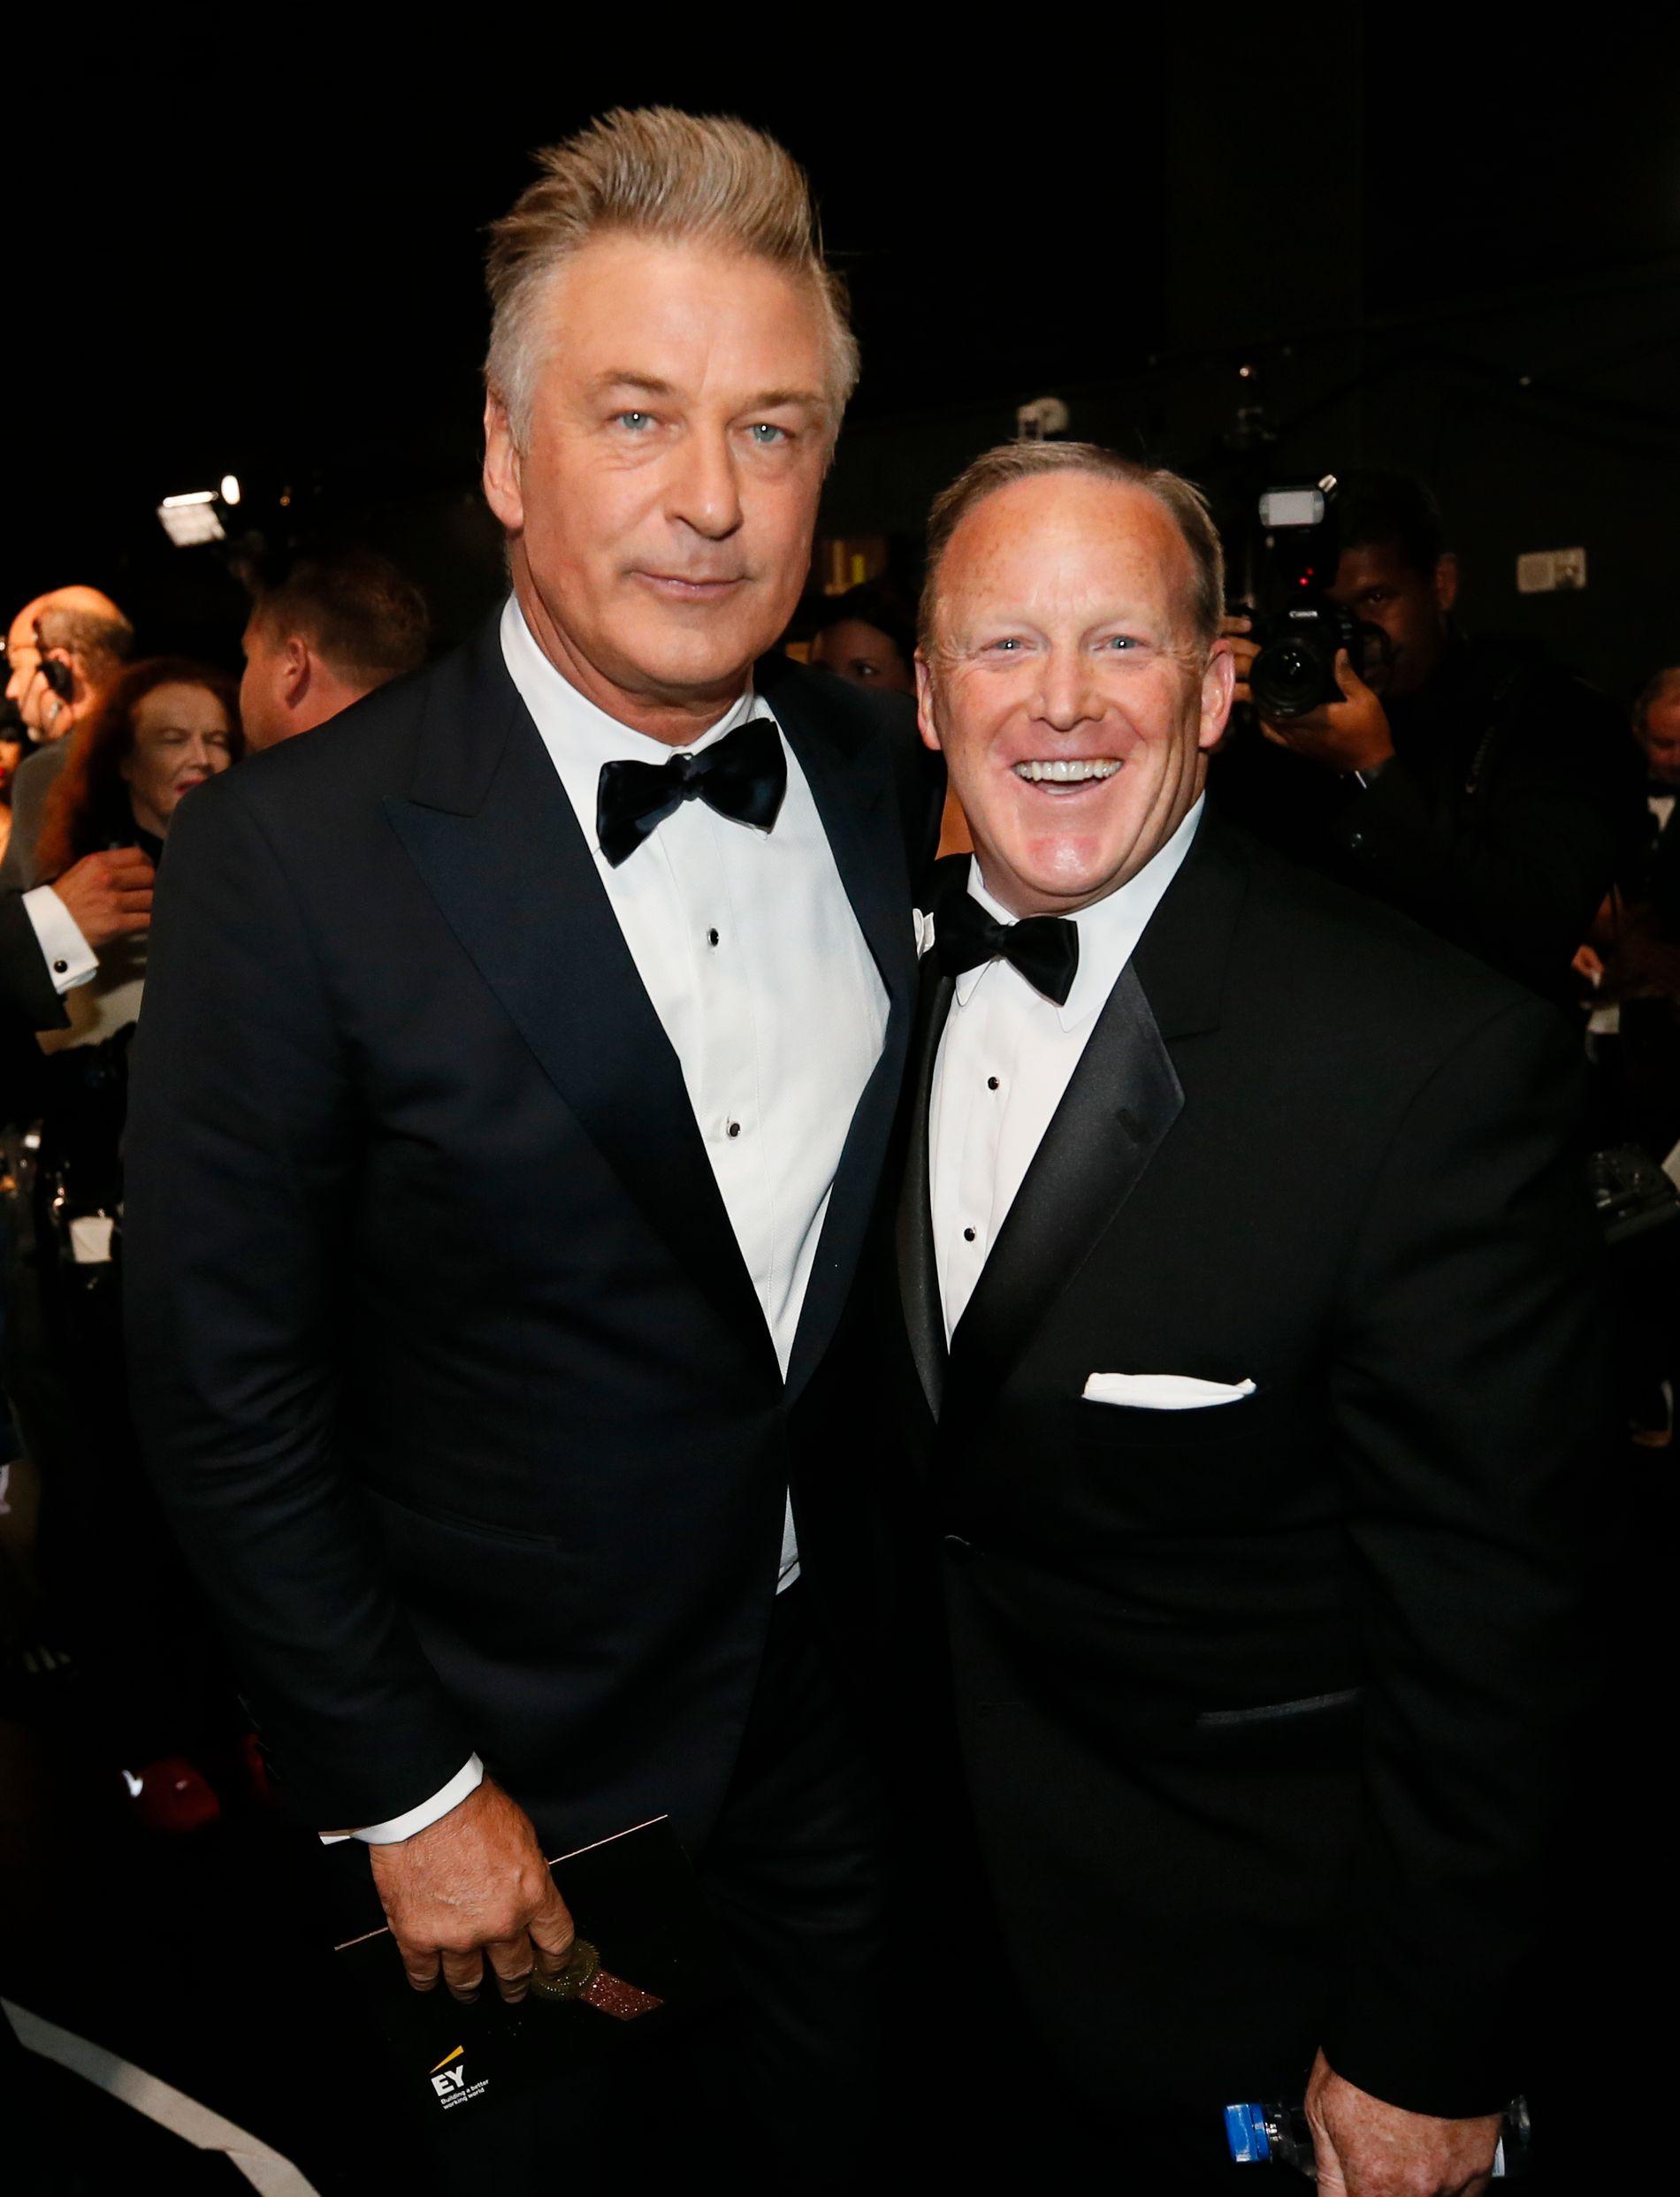 POSERTE SAMMEN: Prisvinner Alec Baldwin og Sean Spicer.